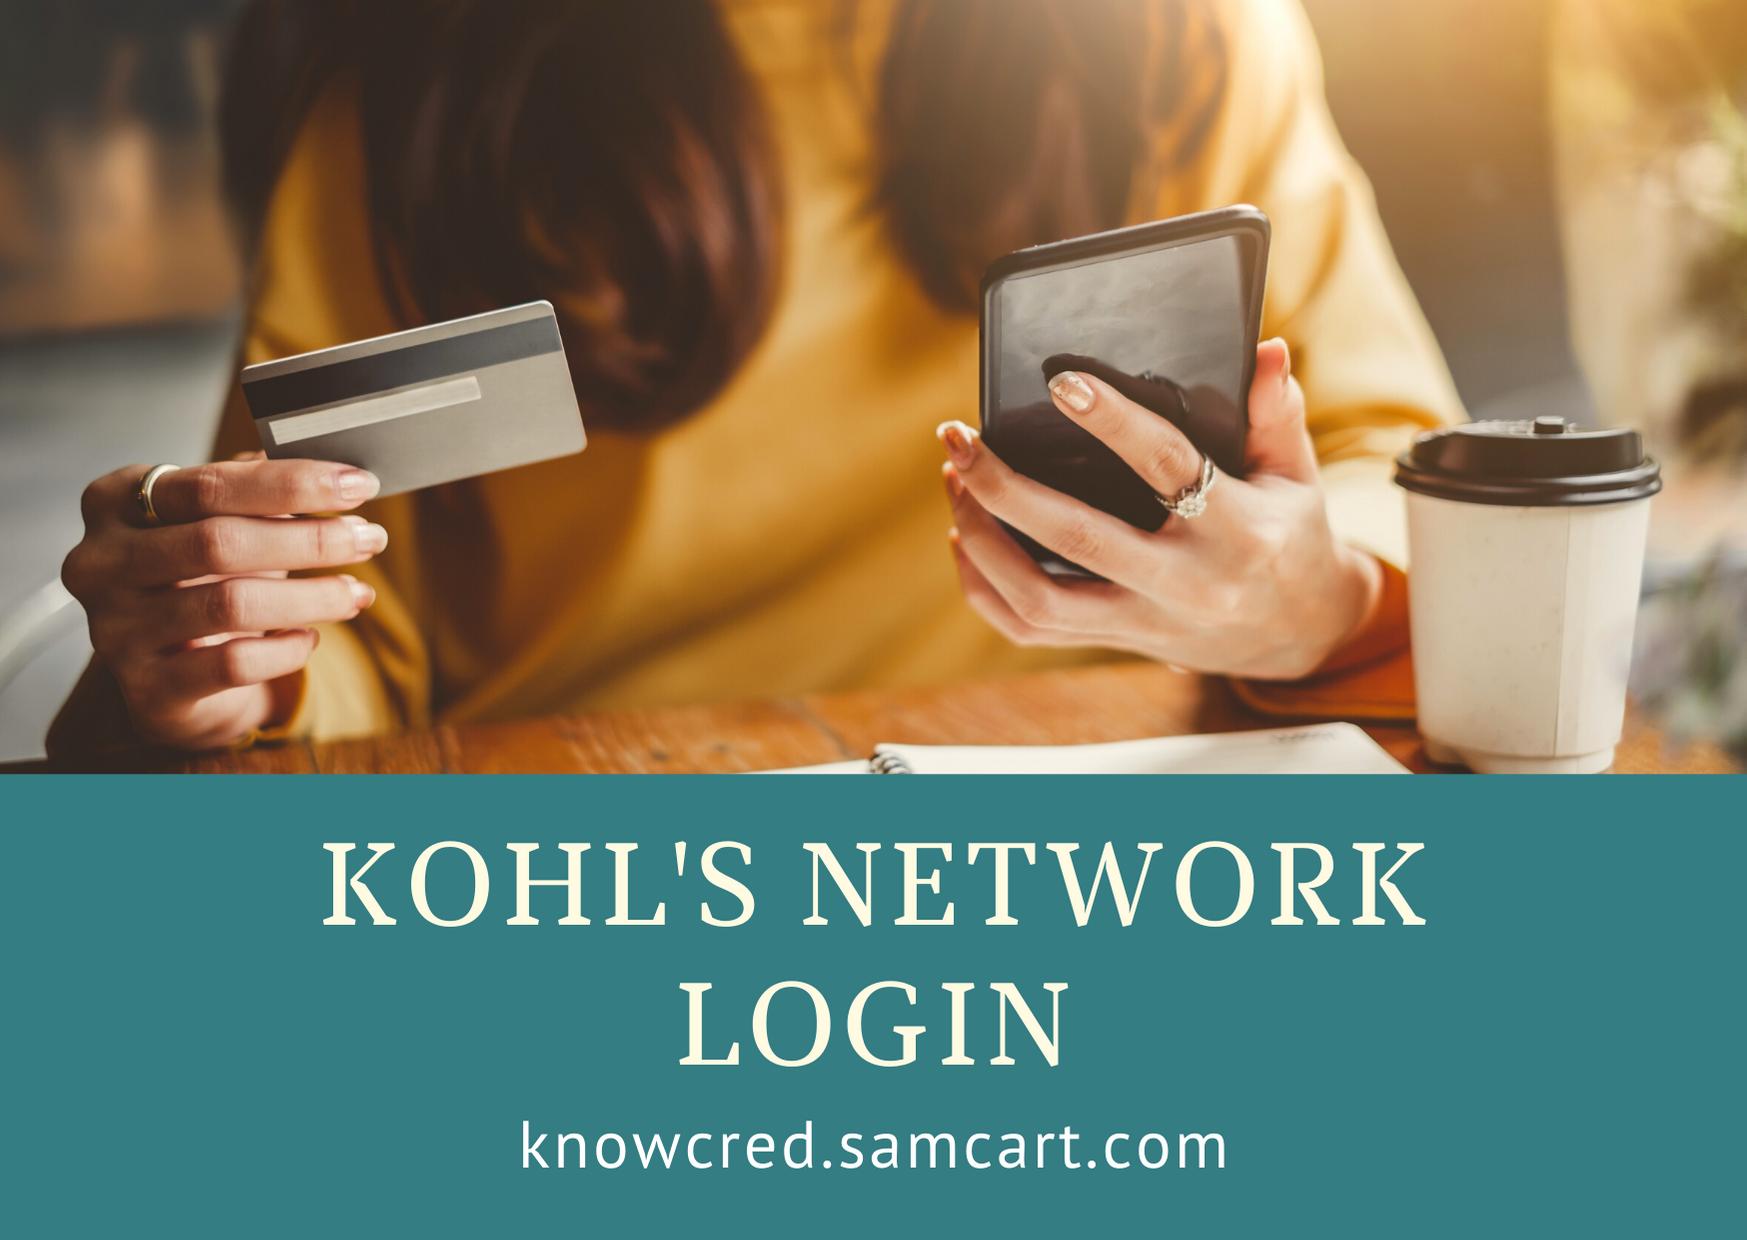 Kohl S Network Login Credit Card Application Networking Credit Card